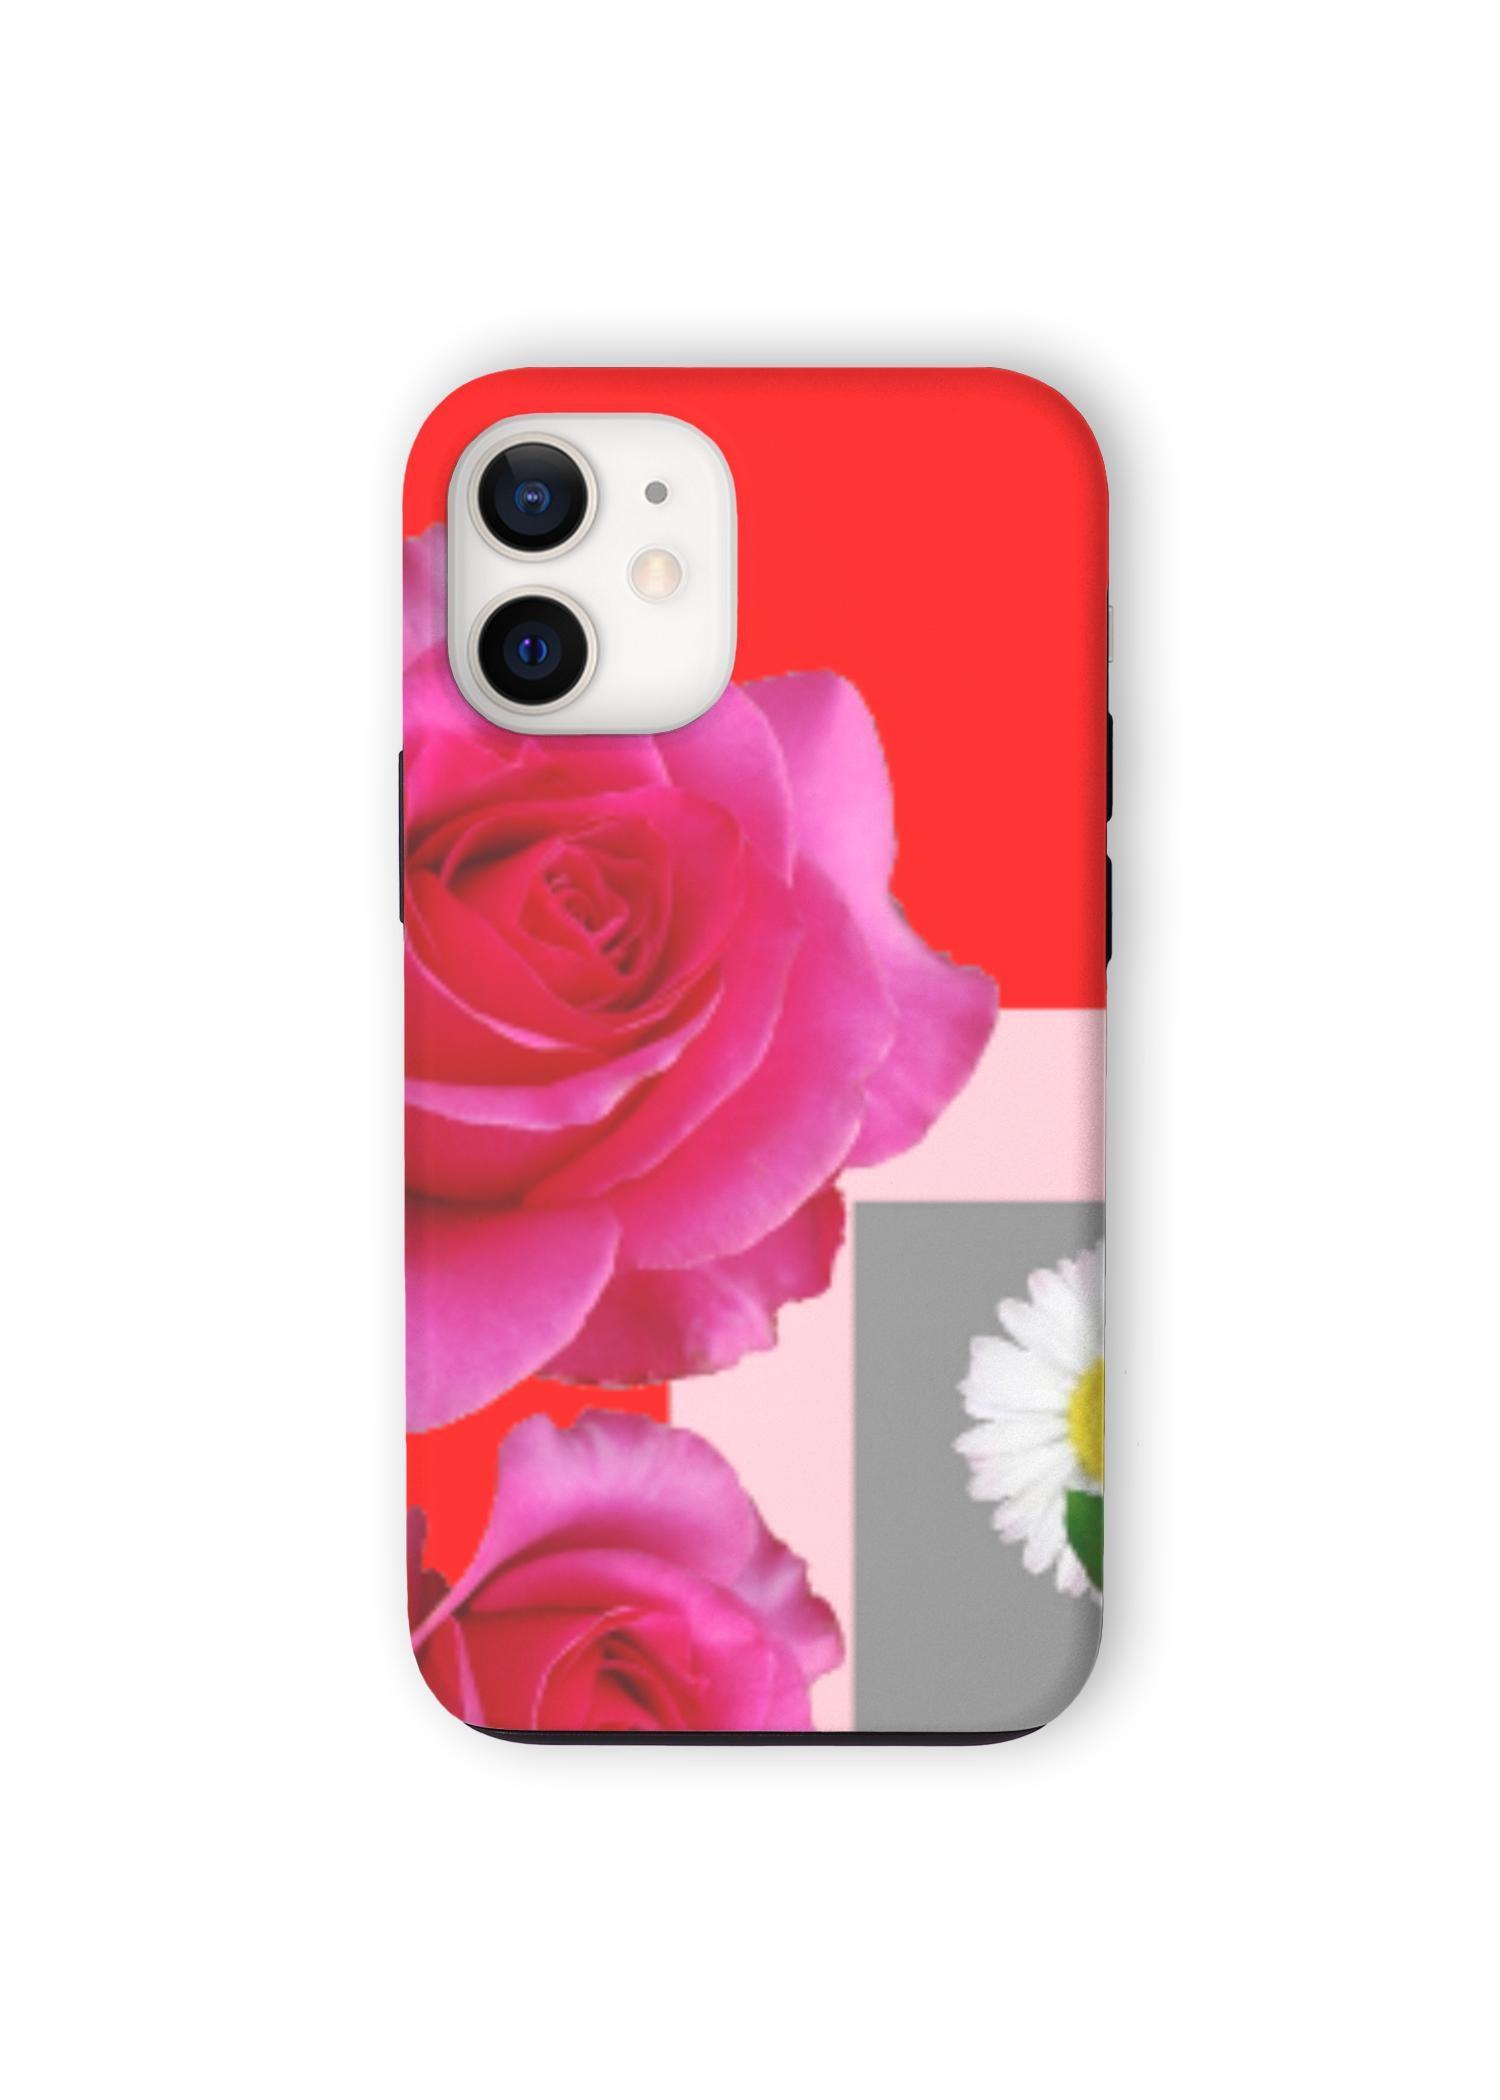 VIDA iPhone Case - Red Rose Garden Art by VIDA Original Artist  - Size: iPhone 12 Mini / Tough